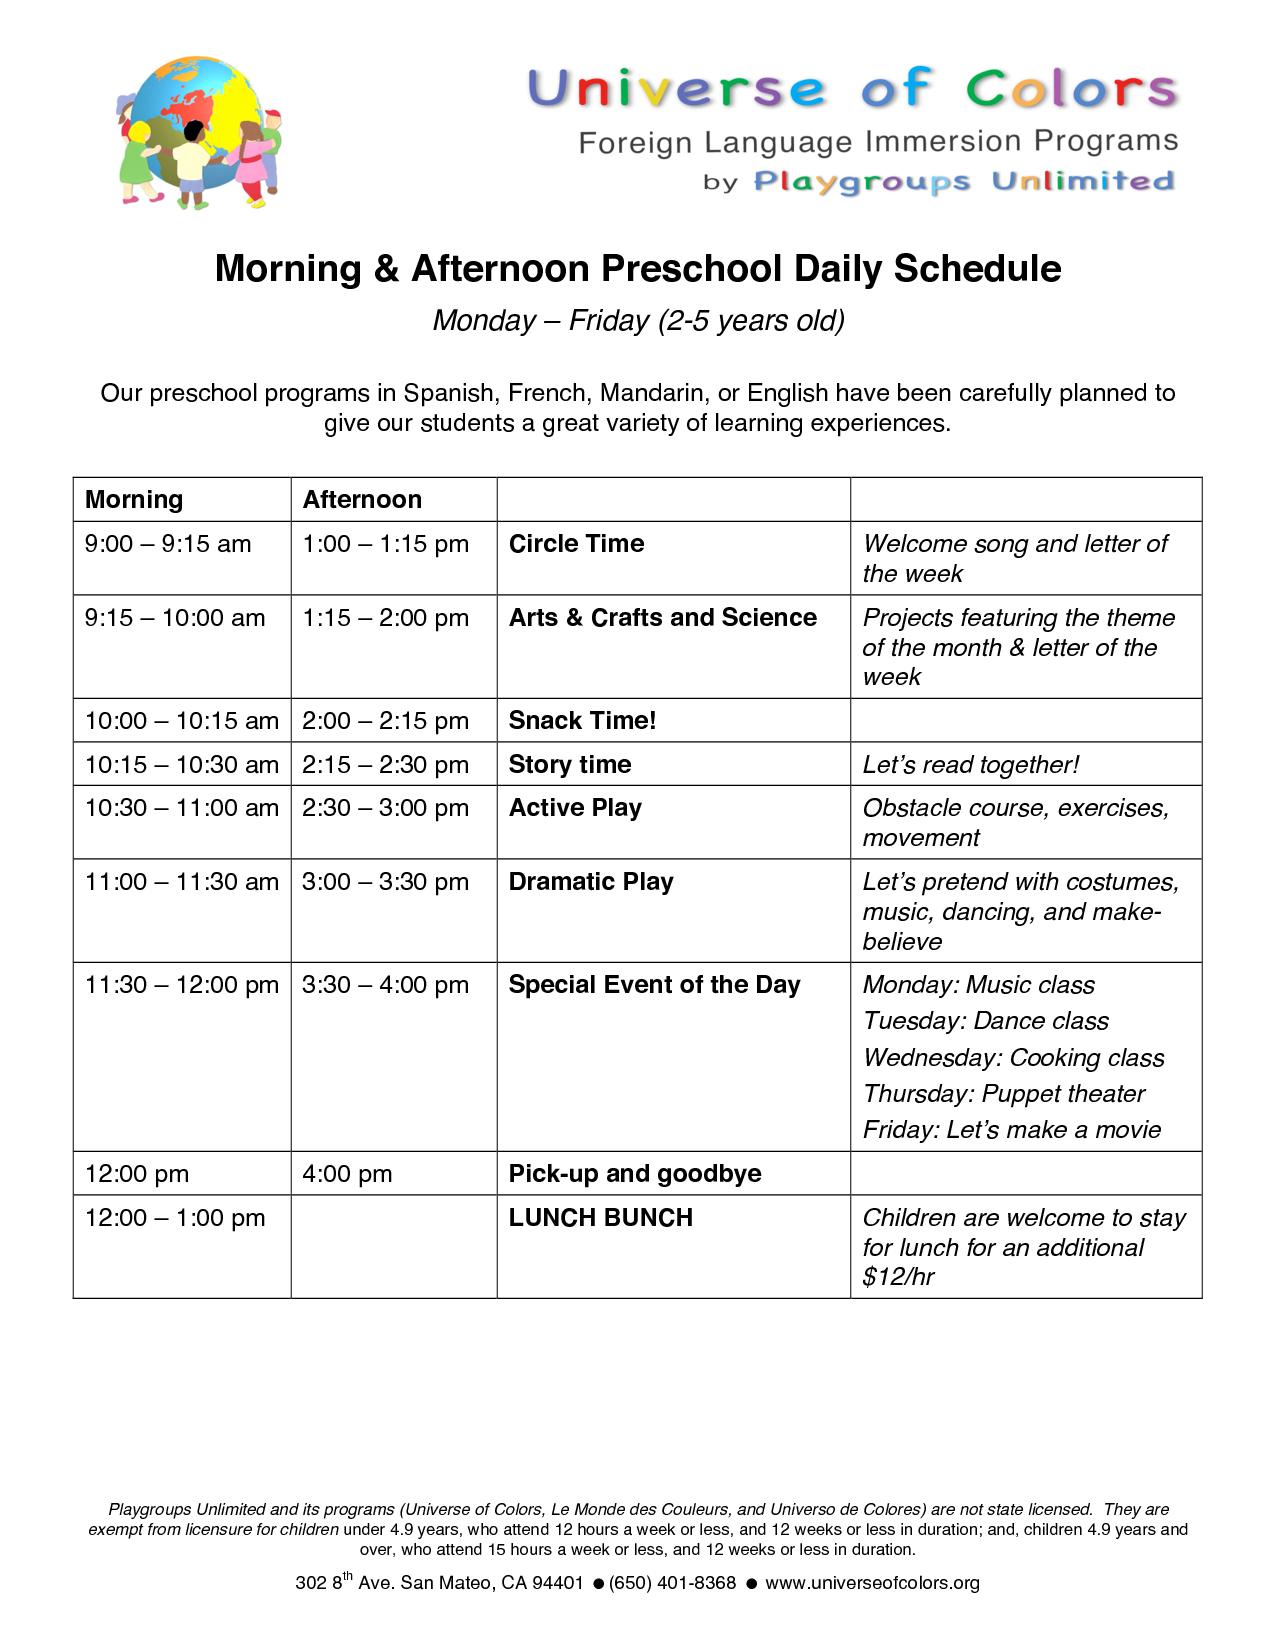 UOC-Preschool Daily Schedule | Nanny - Homeschooling Ideas | Pinterest